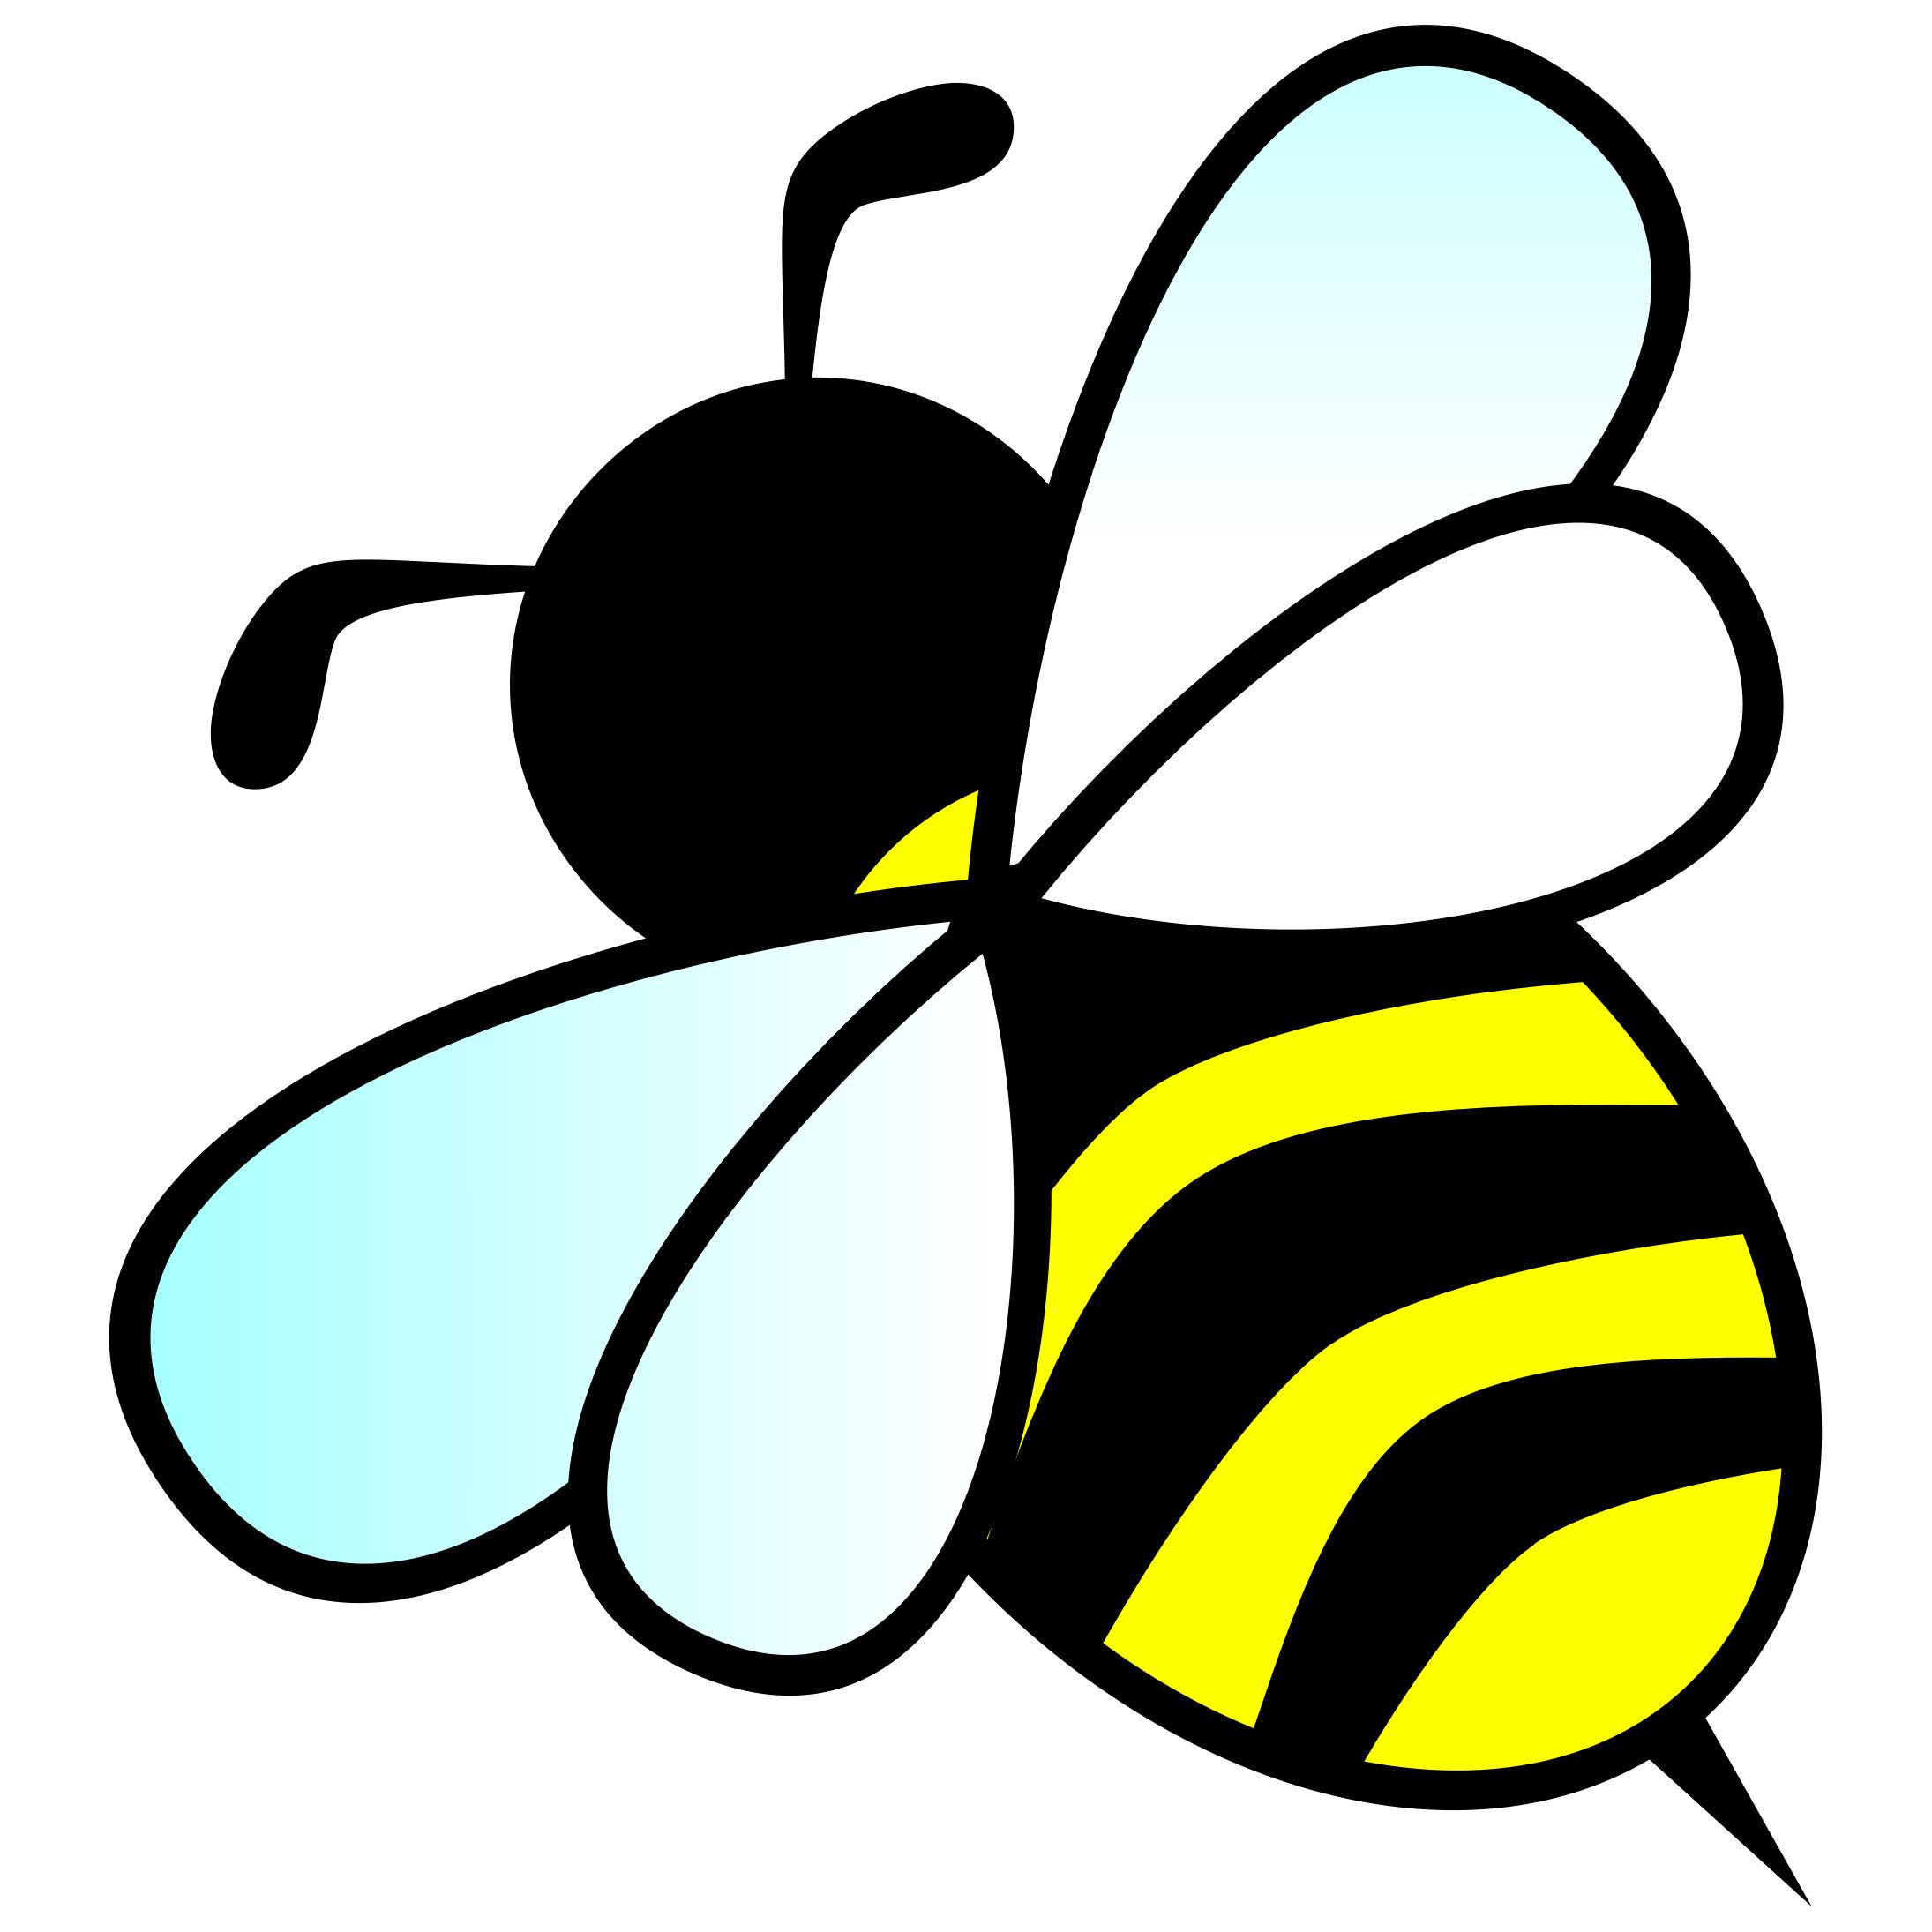 2190x2190 Bumble Bee Cute Bee Clip Art Love Bees Cartoon Clip Art More Clip